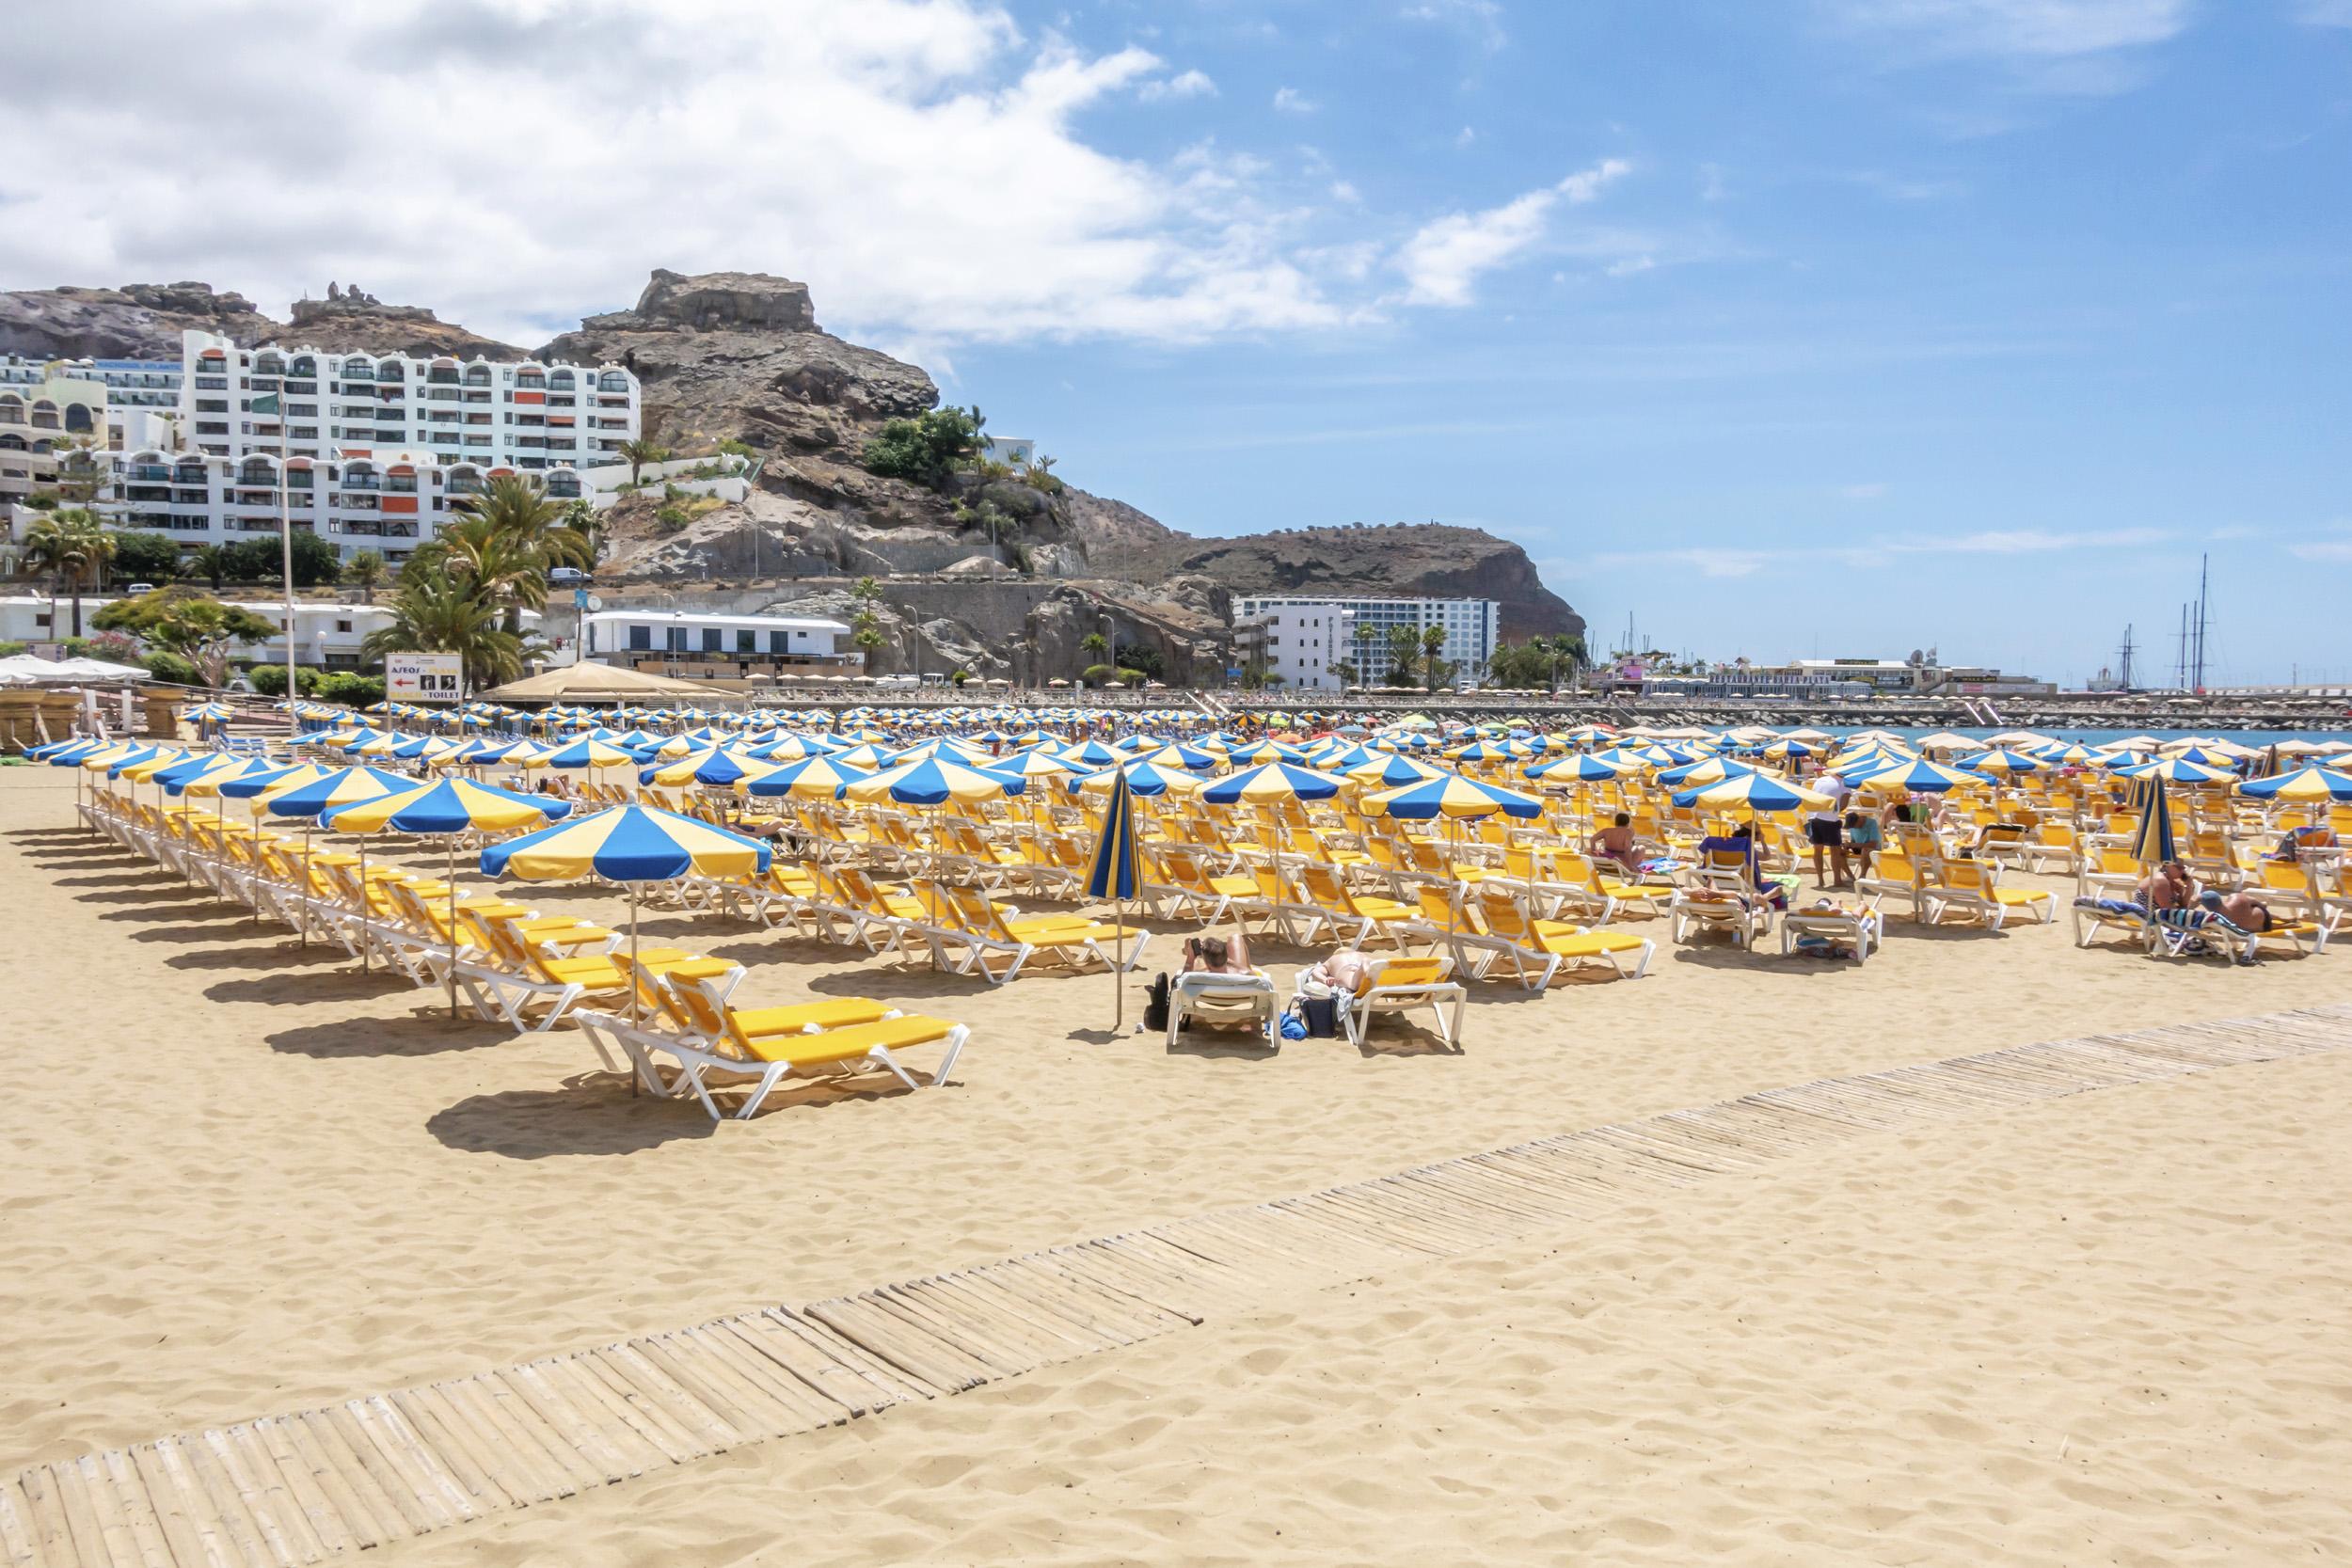 Puerto Rico Beach, Gran Canaria